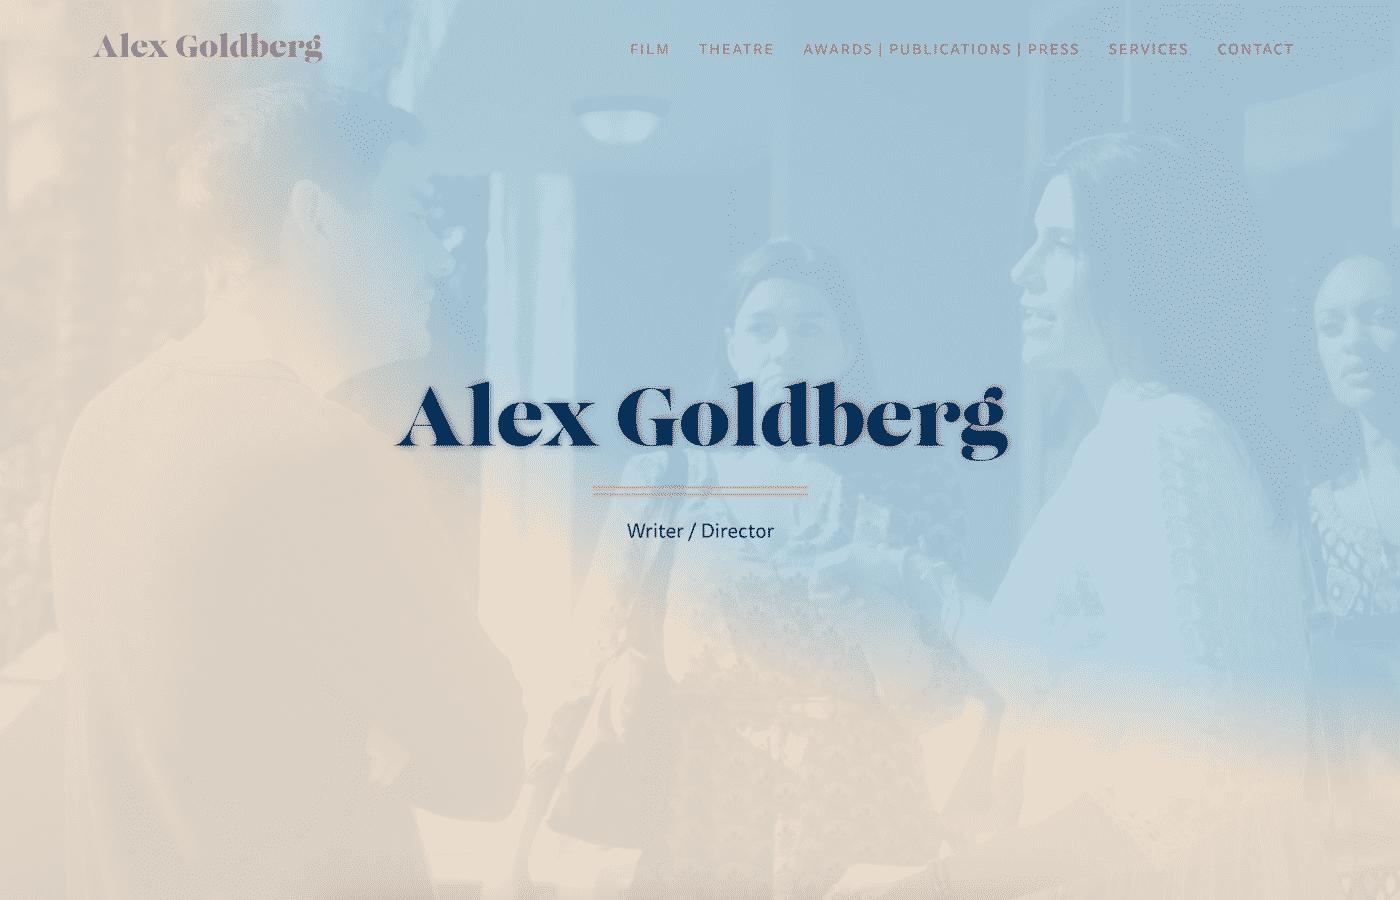 Alex Goldberg